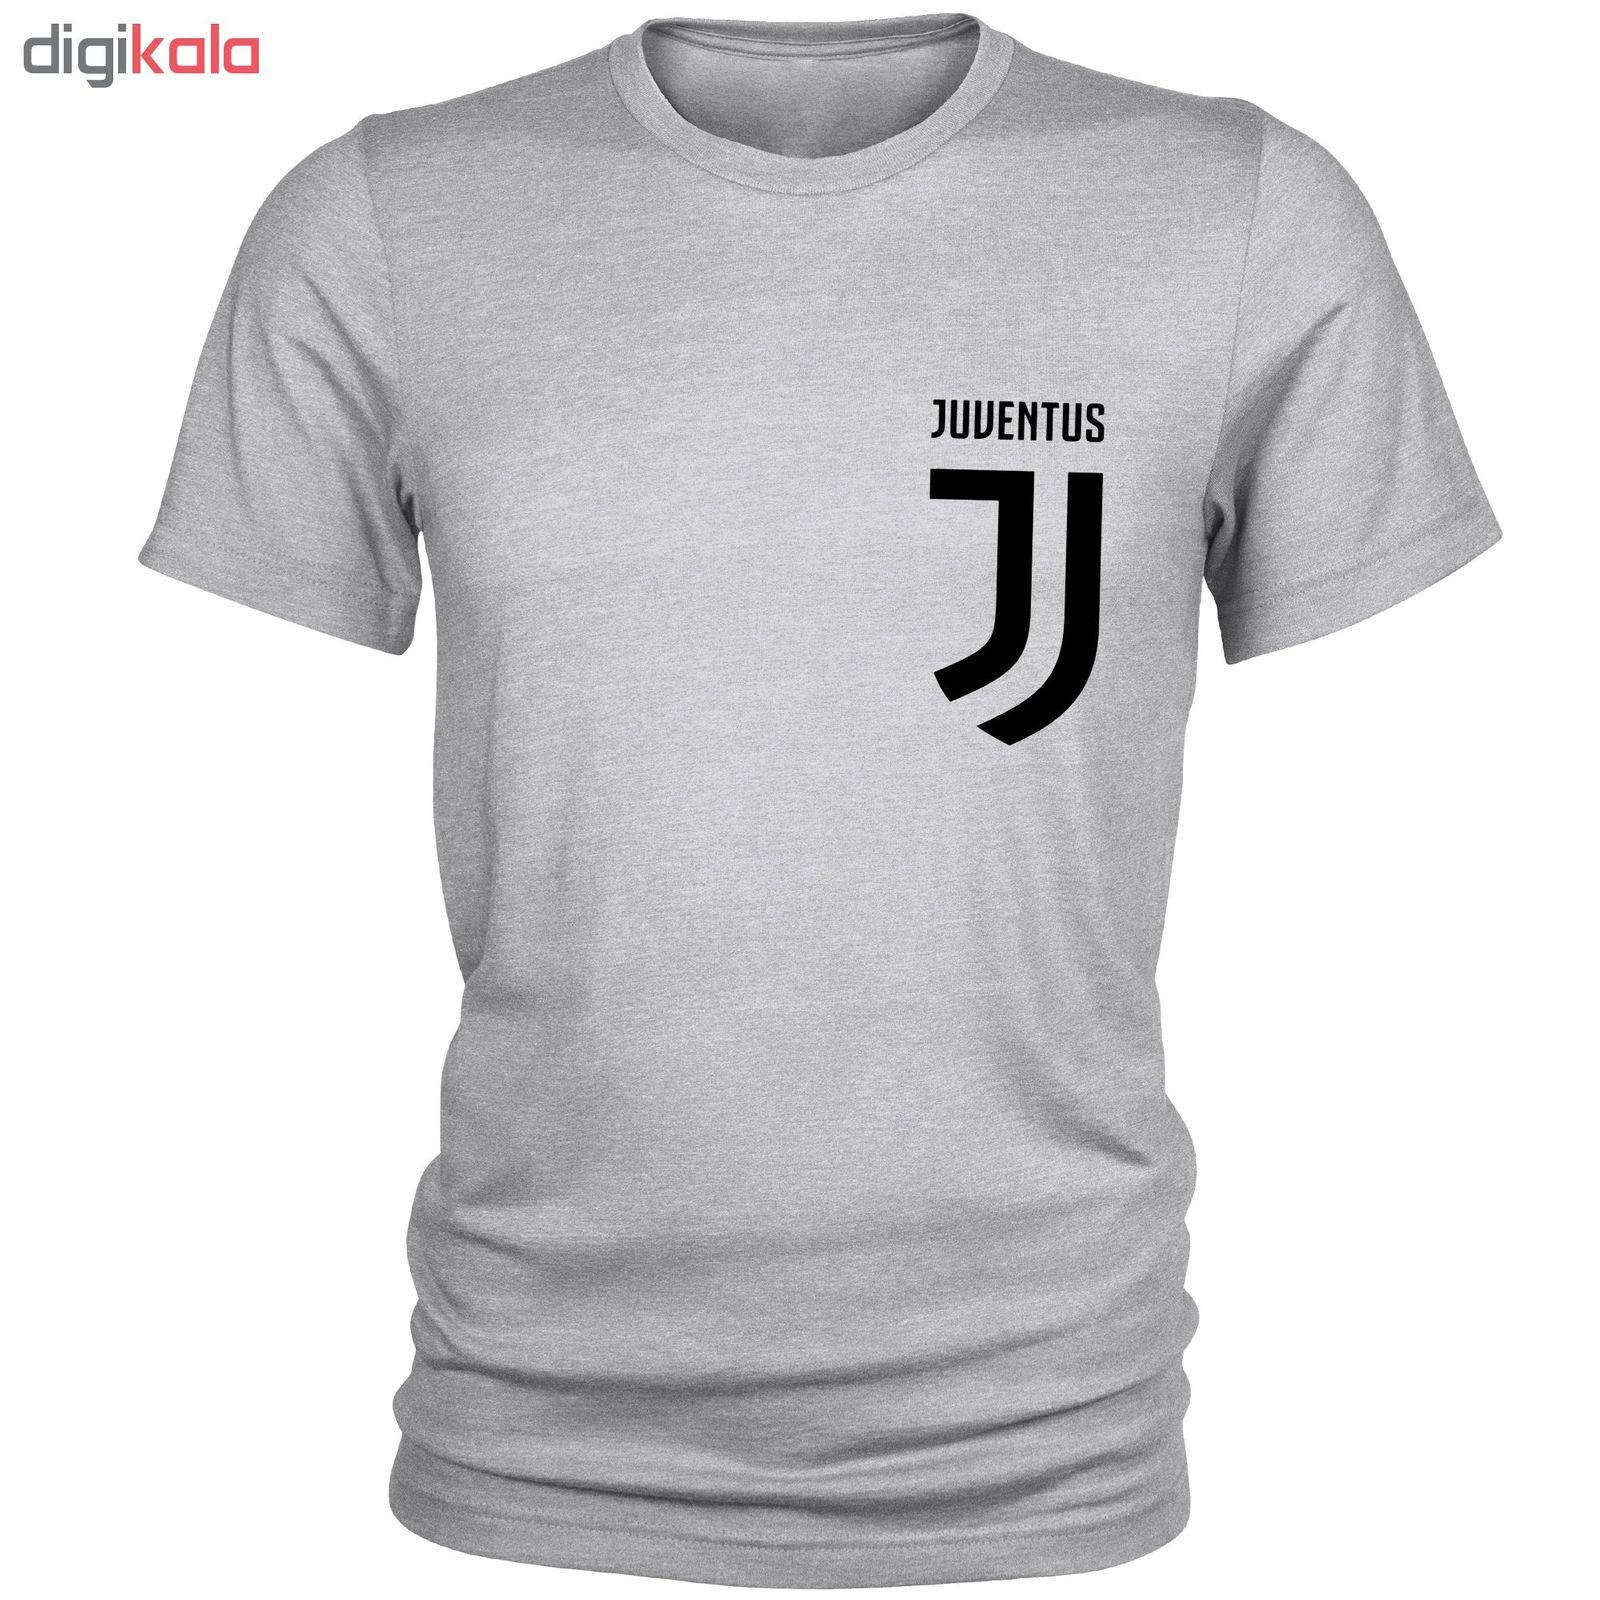 تی شرت مردانه طرح یوونتوس کد S08 main 1 1